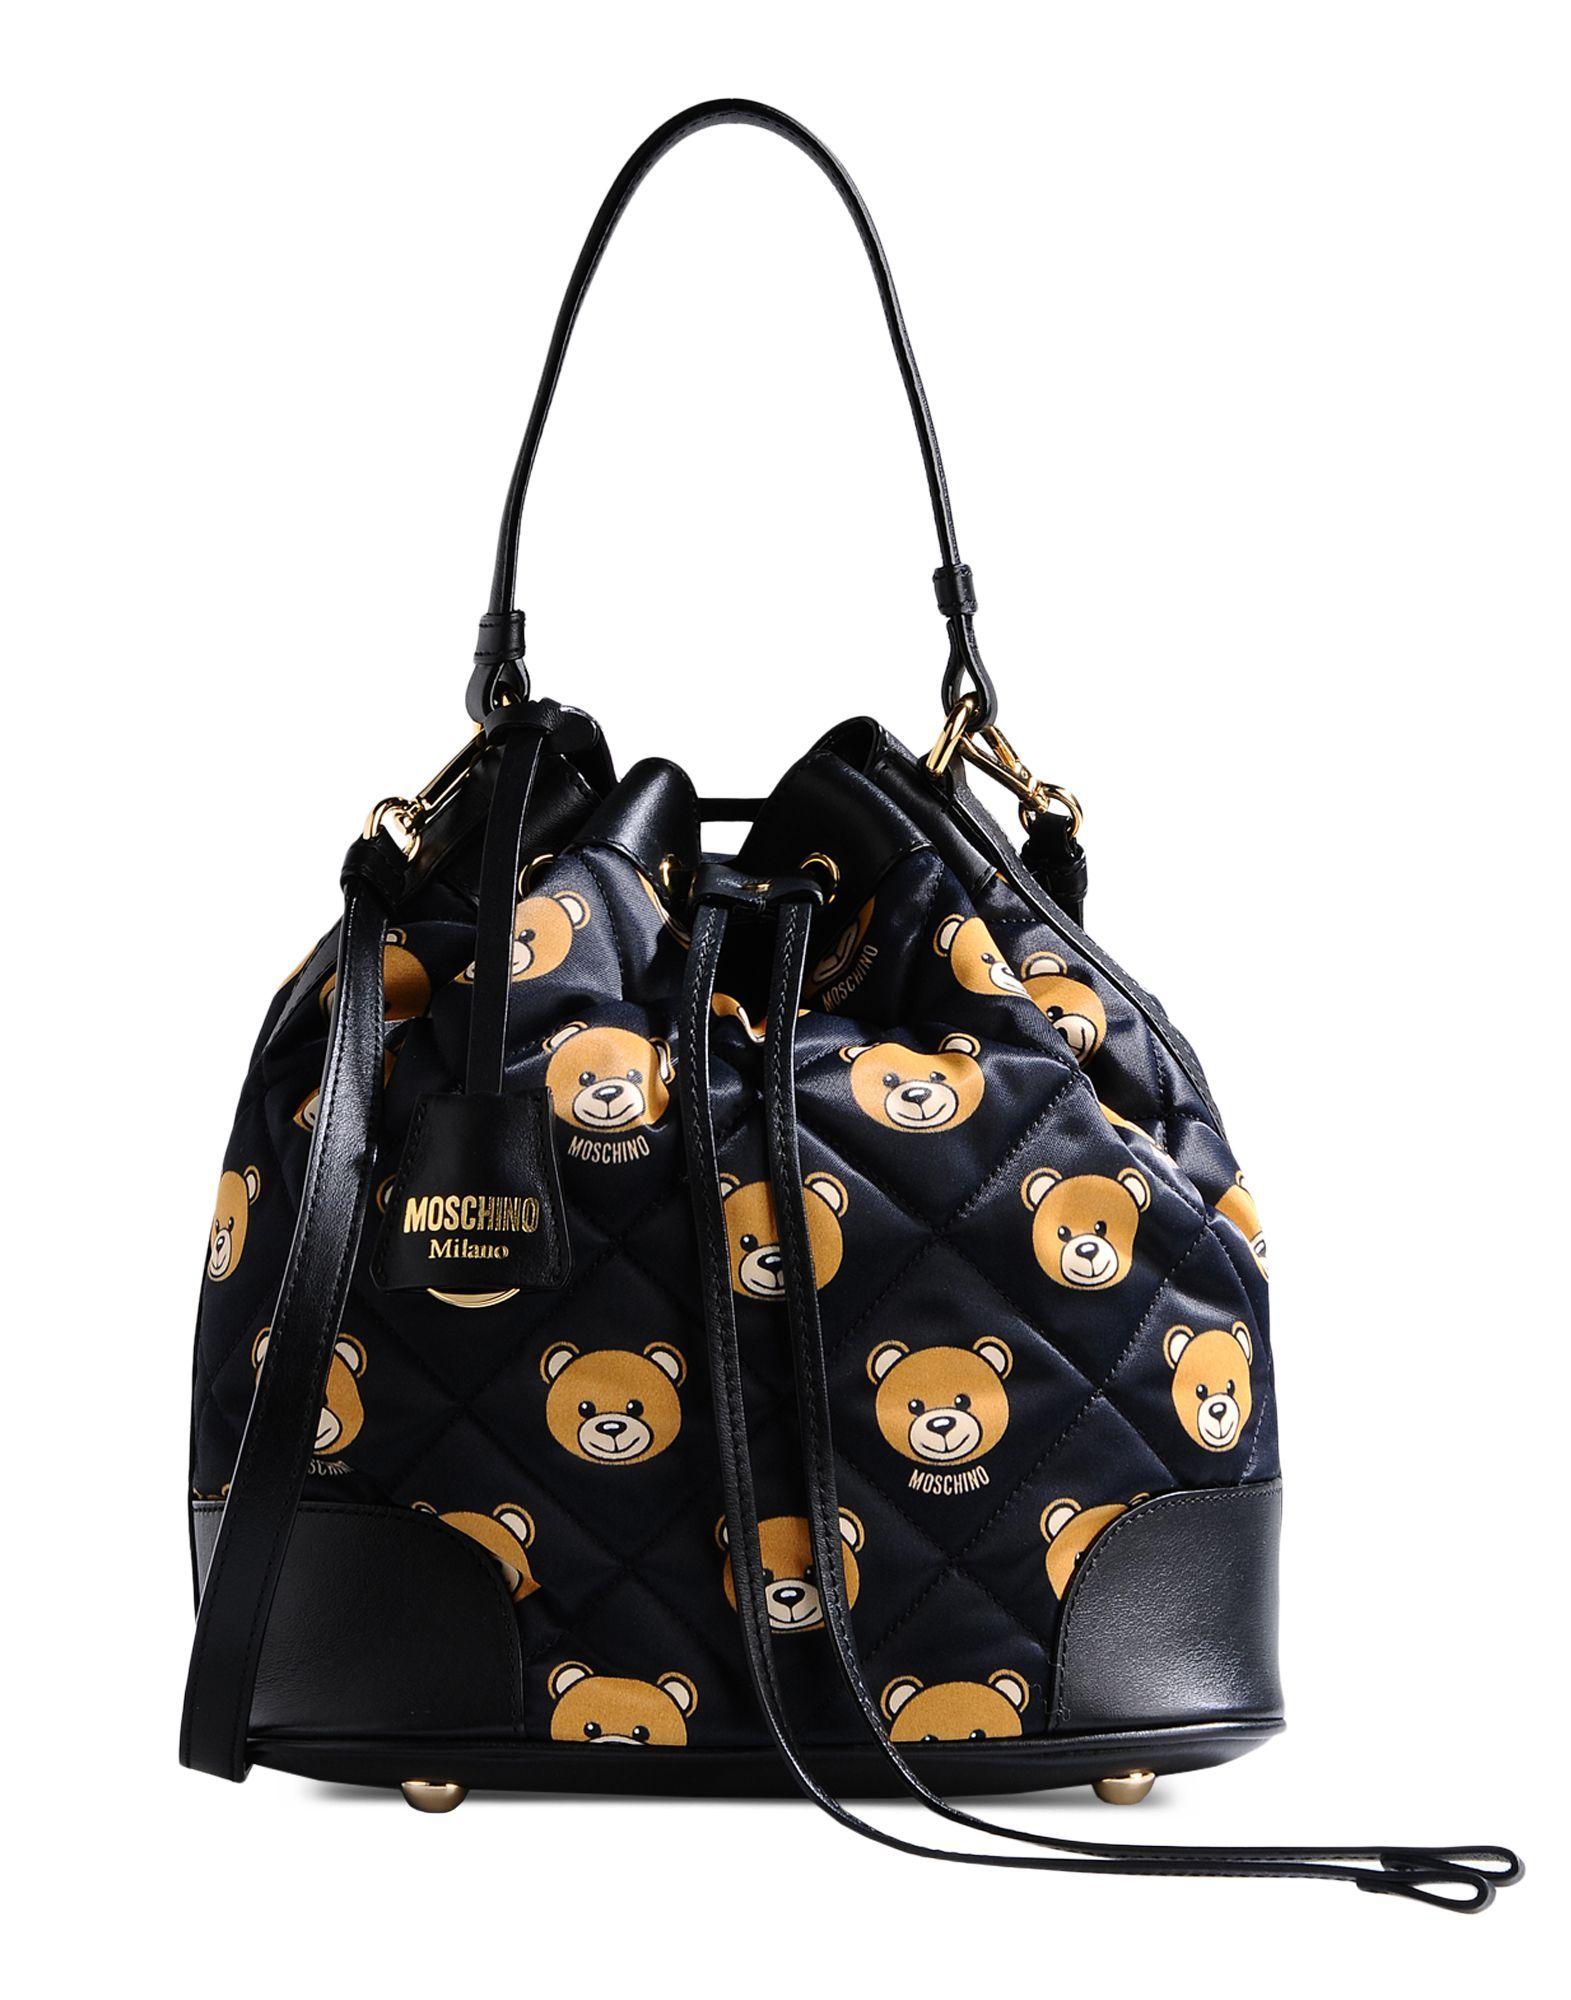 Moschino Medium Fabric Bag in Black | Lyst